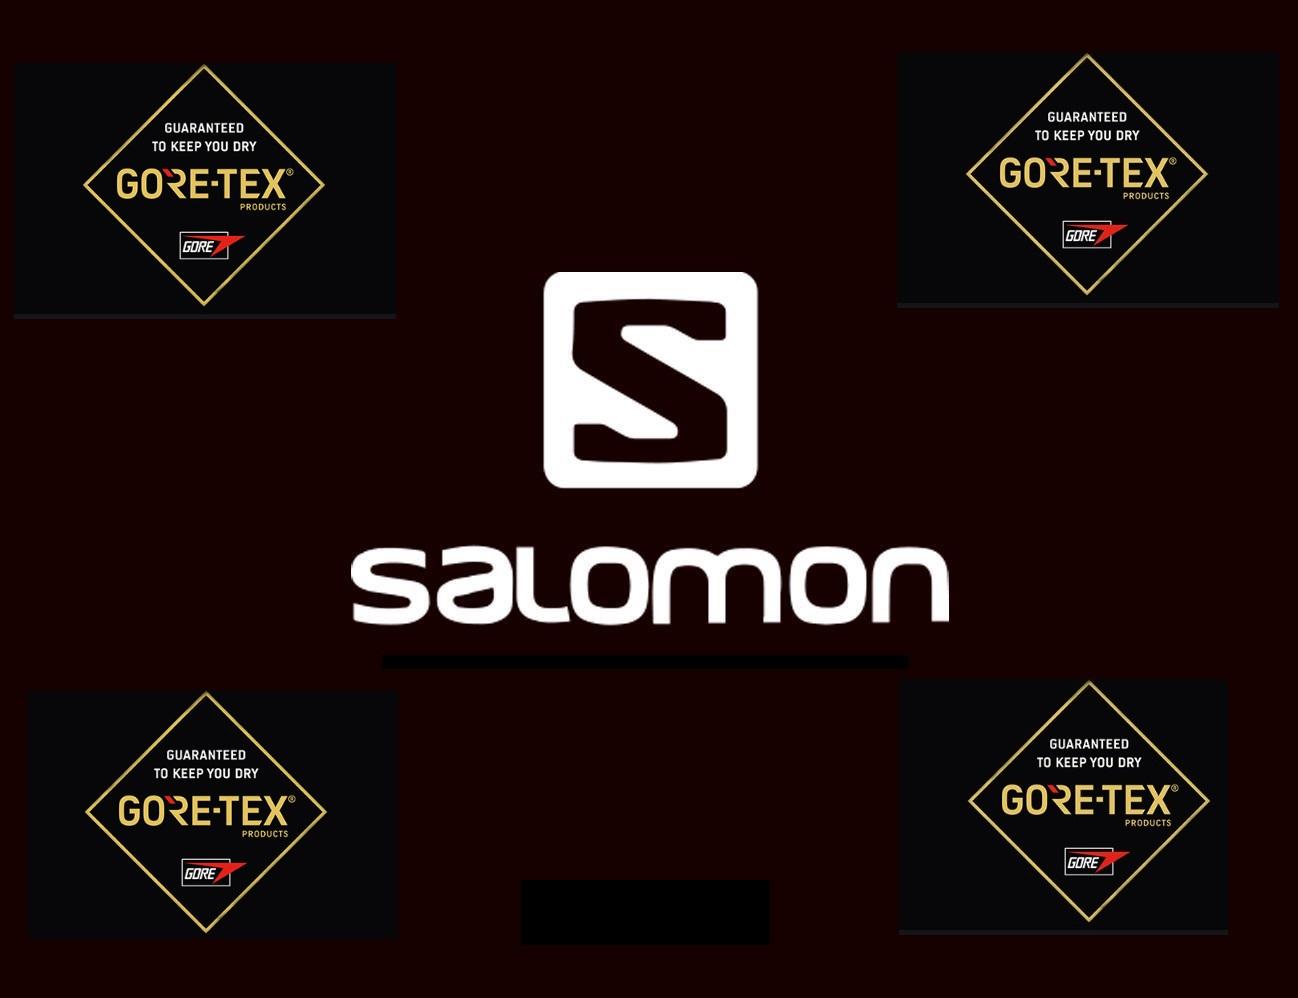 5 CHOLLO ZAPAS SALOMON CON GORE-TEX®